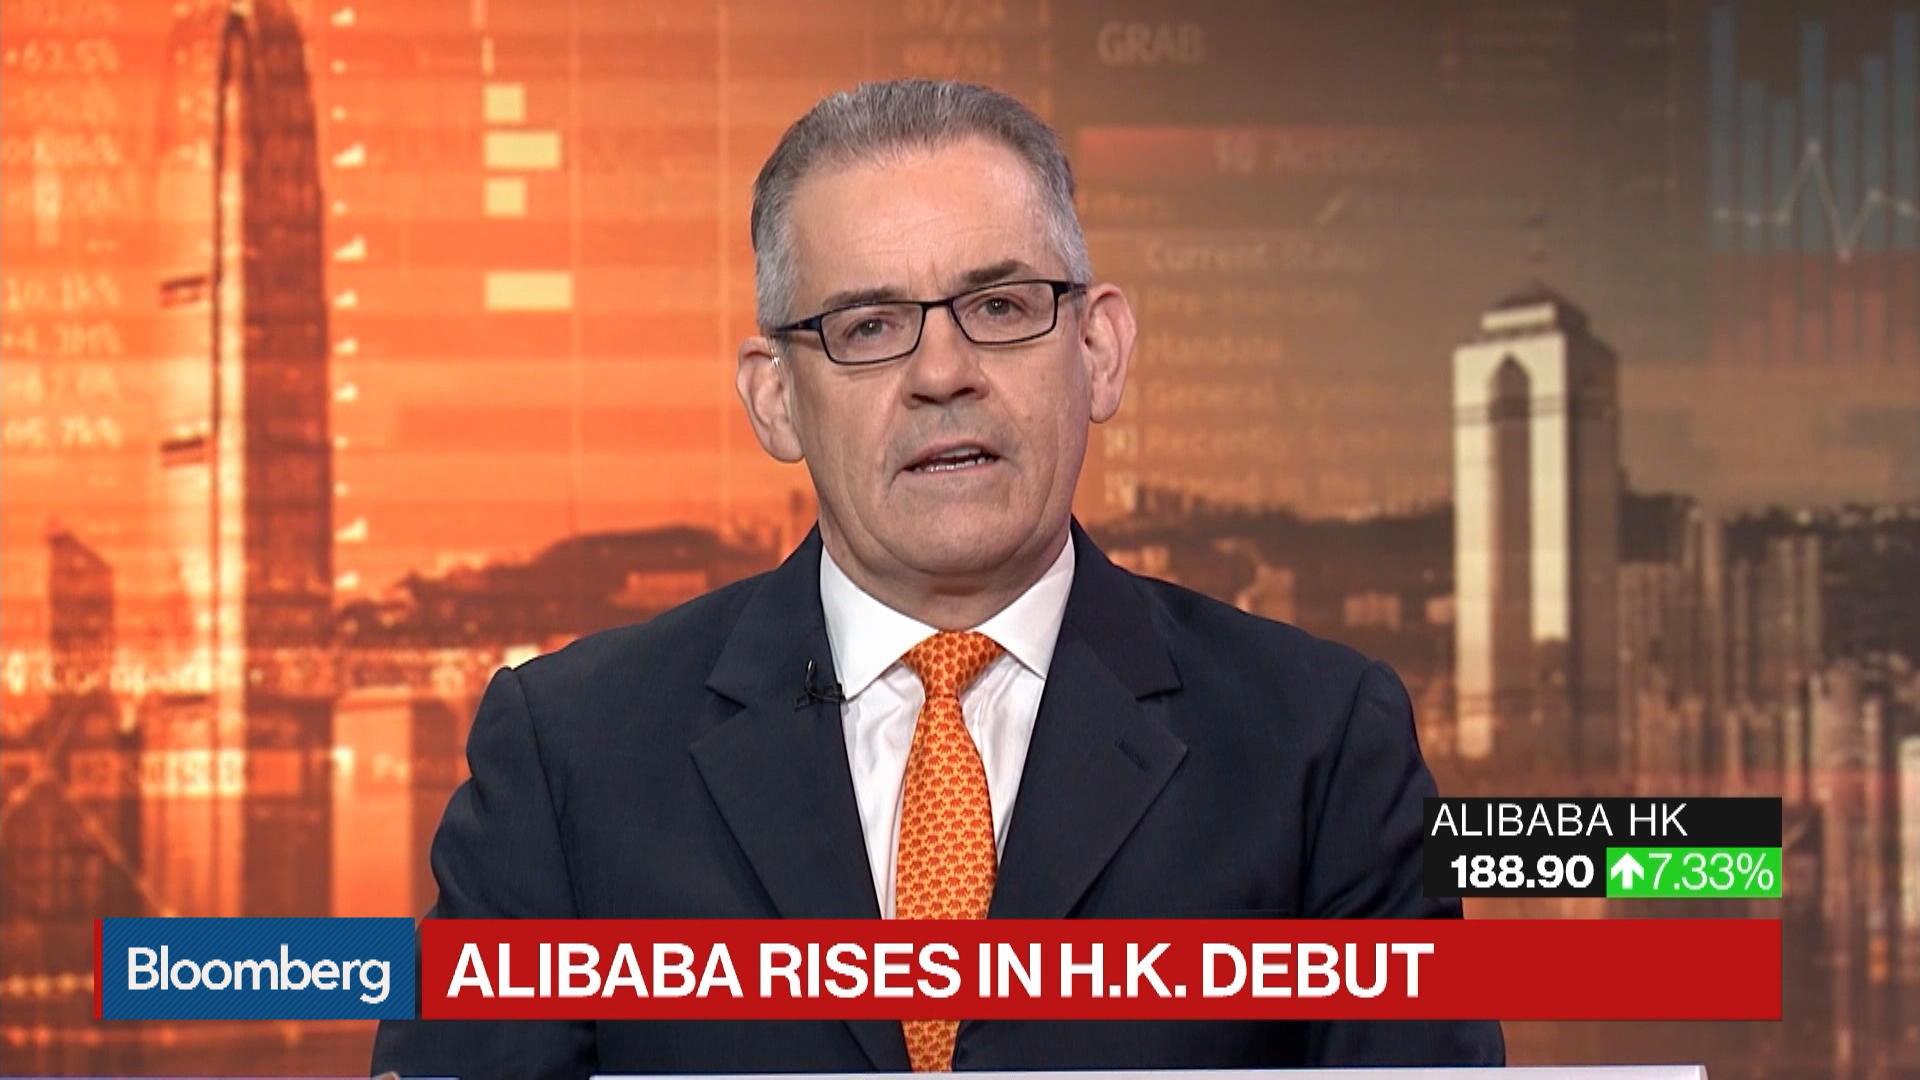 Alibaba Debut in Hong Kong Discussed by Andrew Sullivan, Pearl Bridge Partners Director